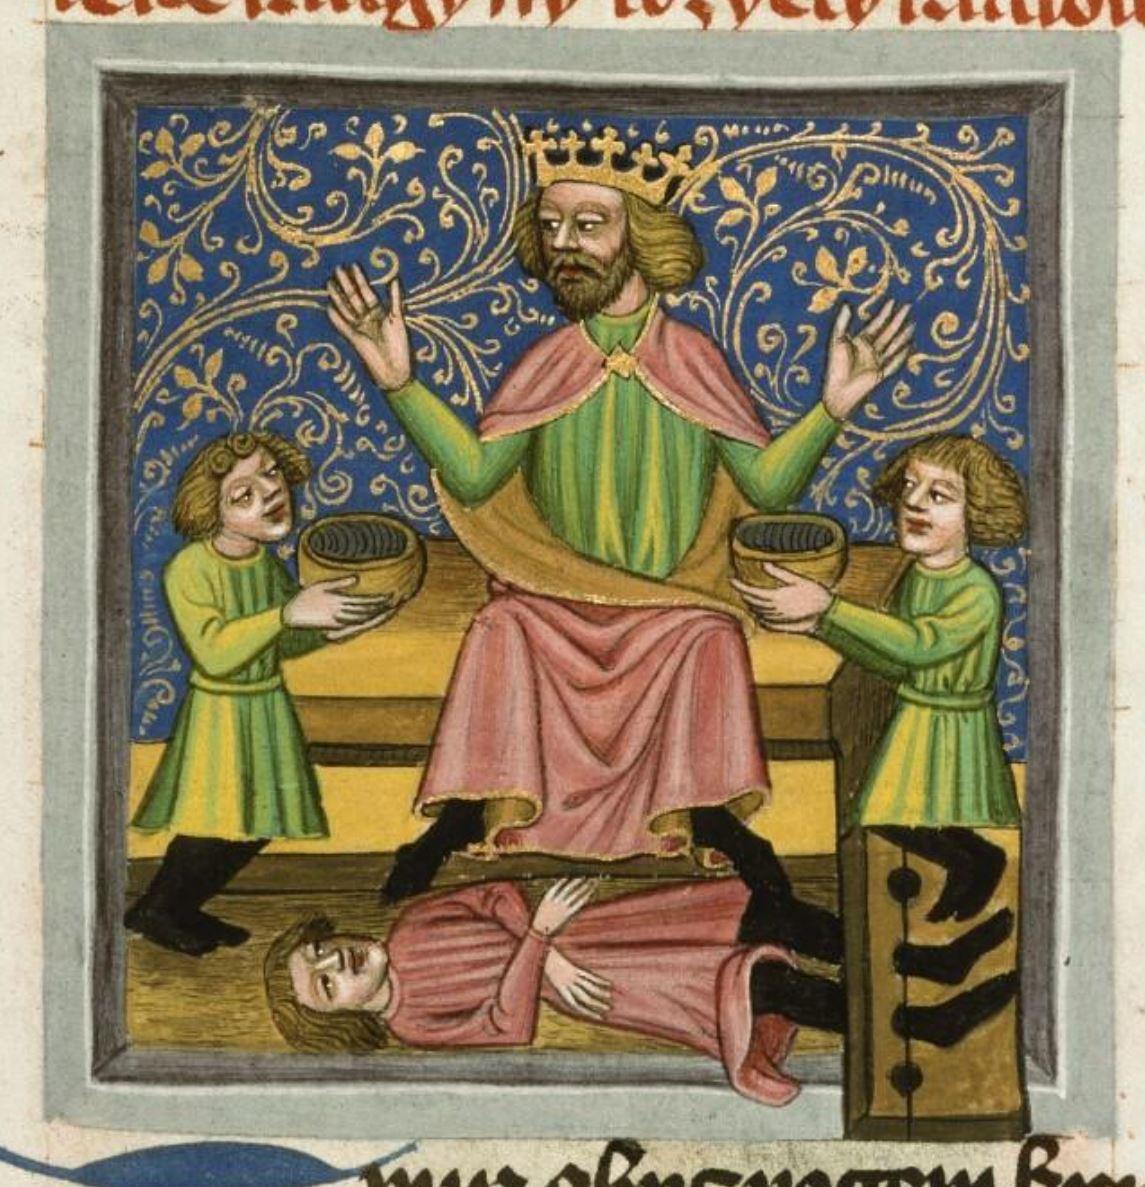 Speculum humanae salvationis, vers 1420, Prague, Musee nat., Bibl., III. B. 10, f. 046